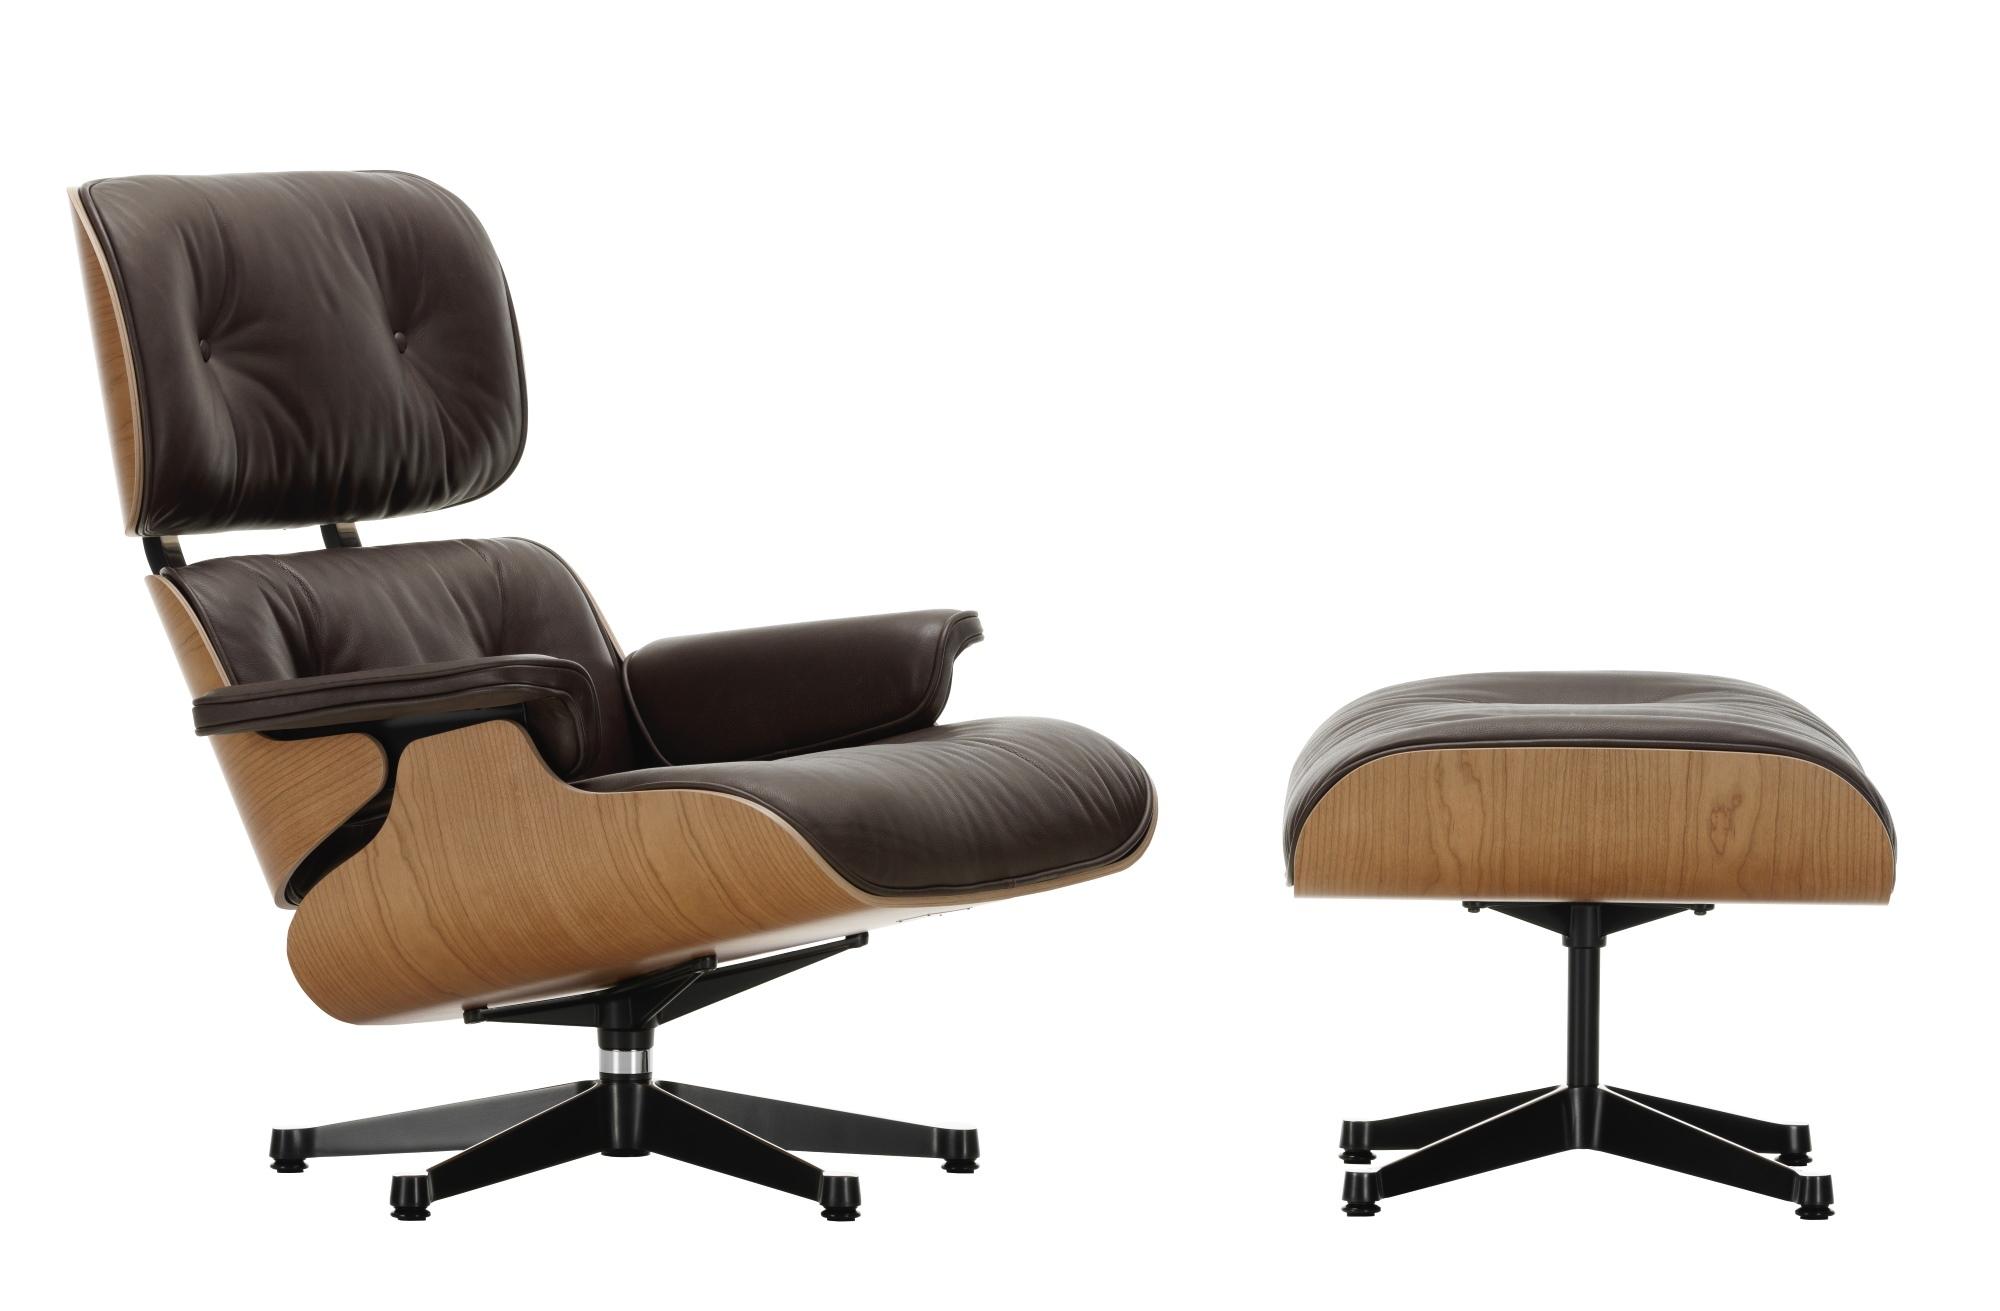 Eames Lounge Chair & Ottoman fauteuil Vitra